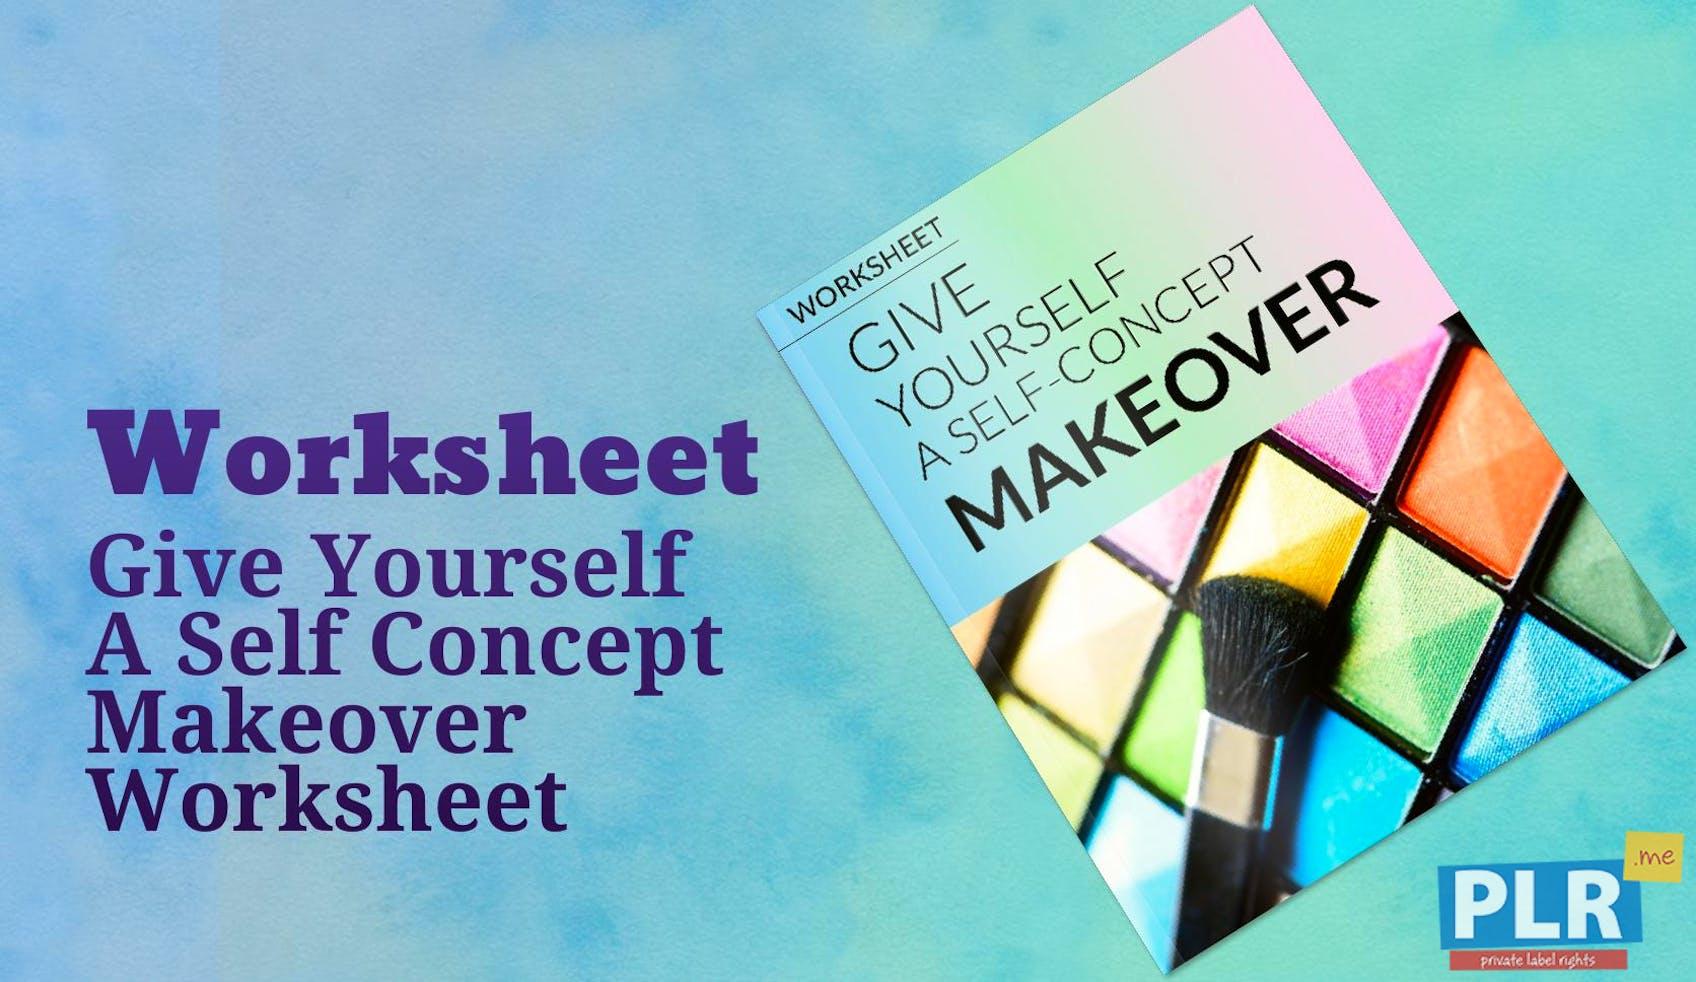 PLR Worksheets - Give Yourself A Self Concept Makeover Worksheet ...